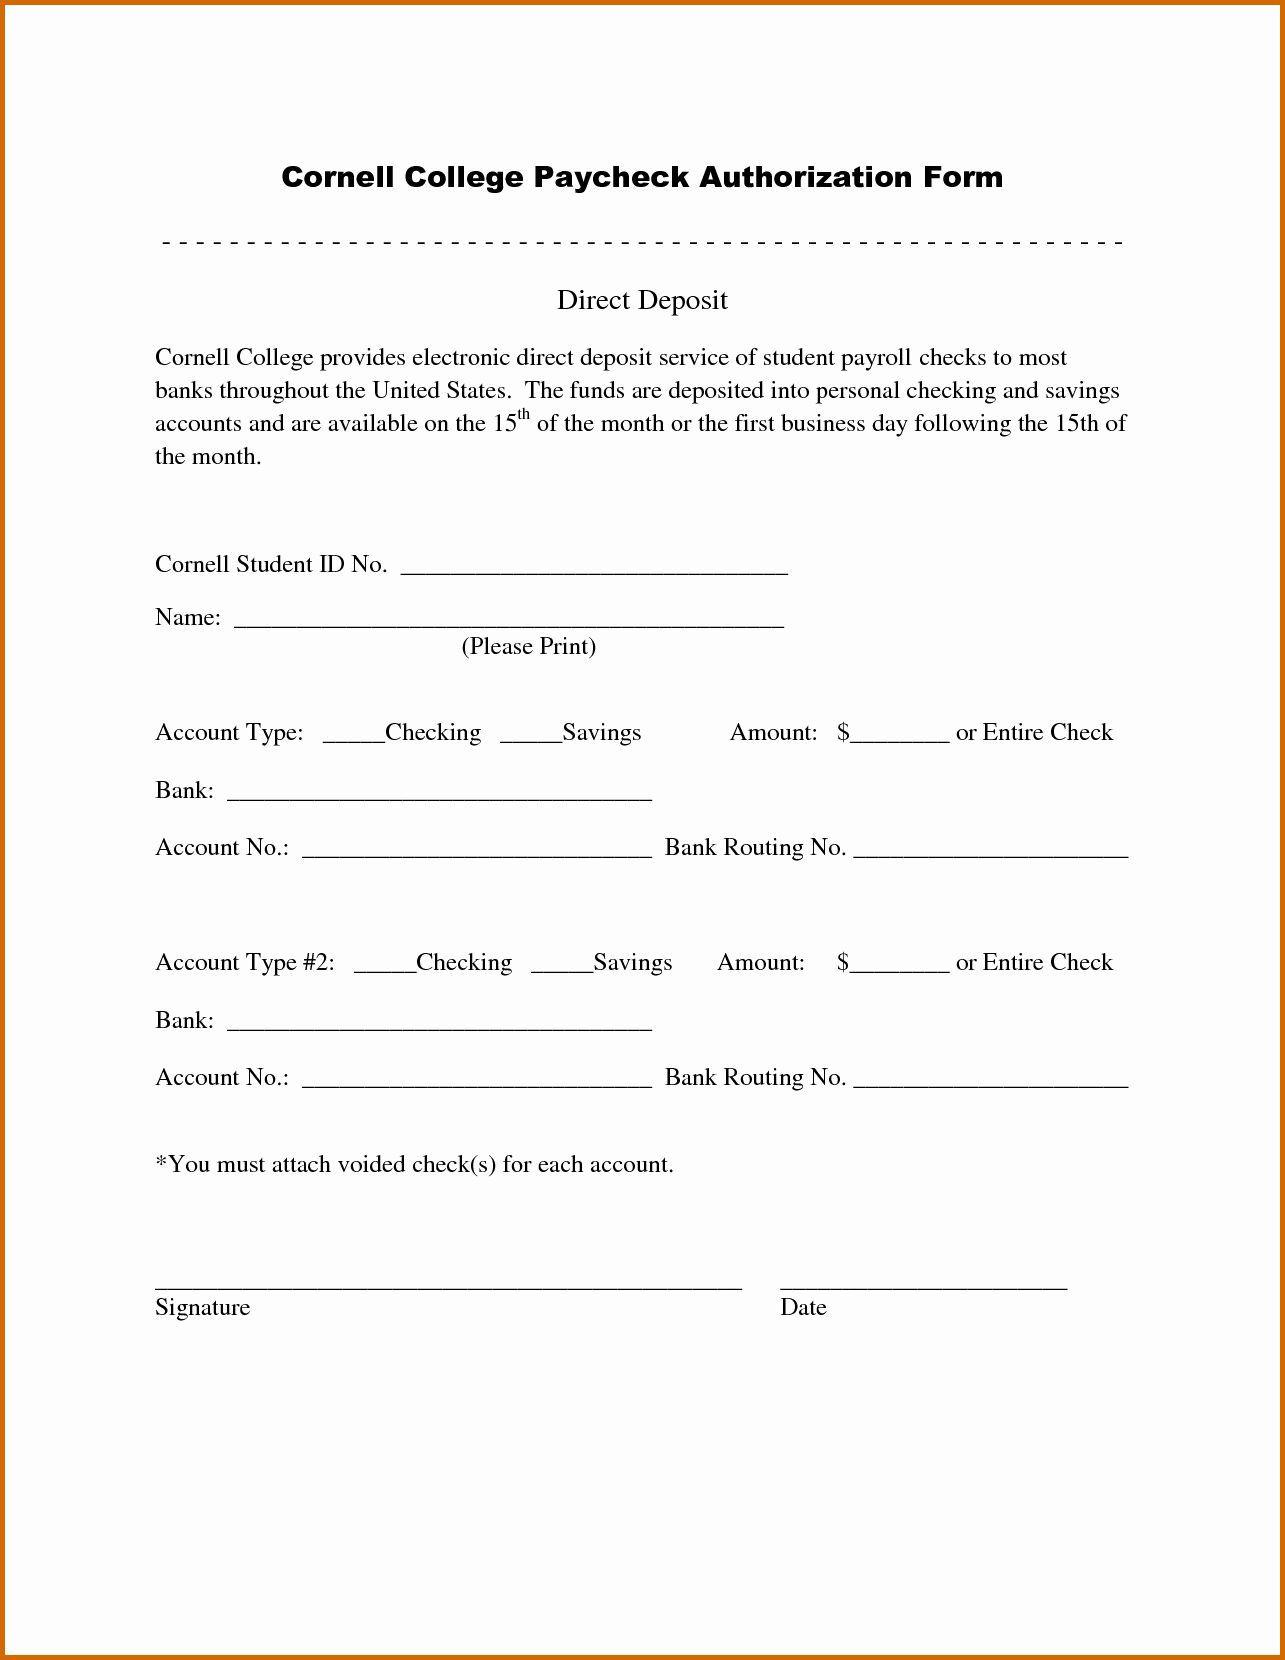 007 Wonderful Direct Deposit Agreement Authorization Form Template High Resolution Full